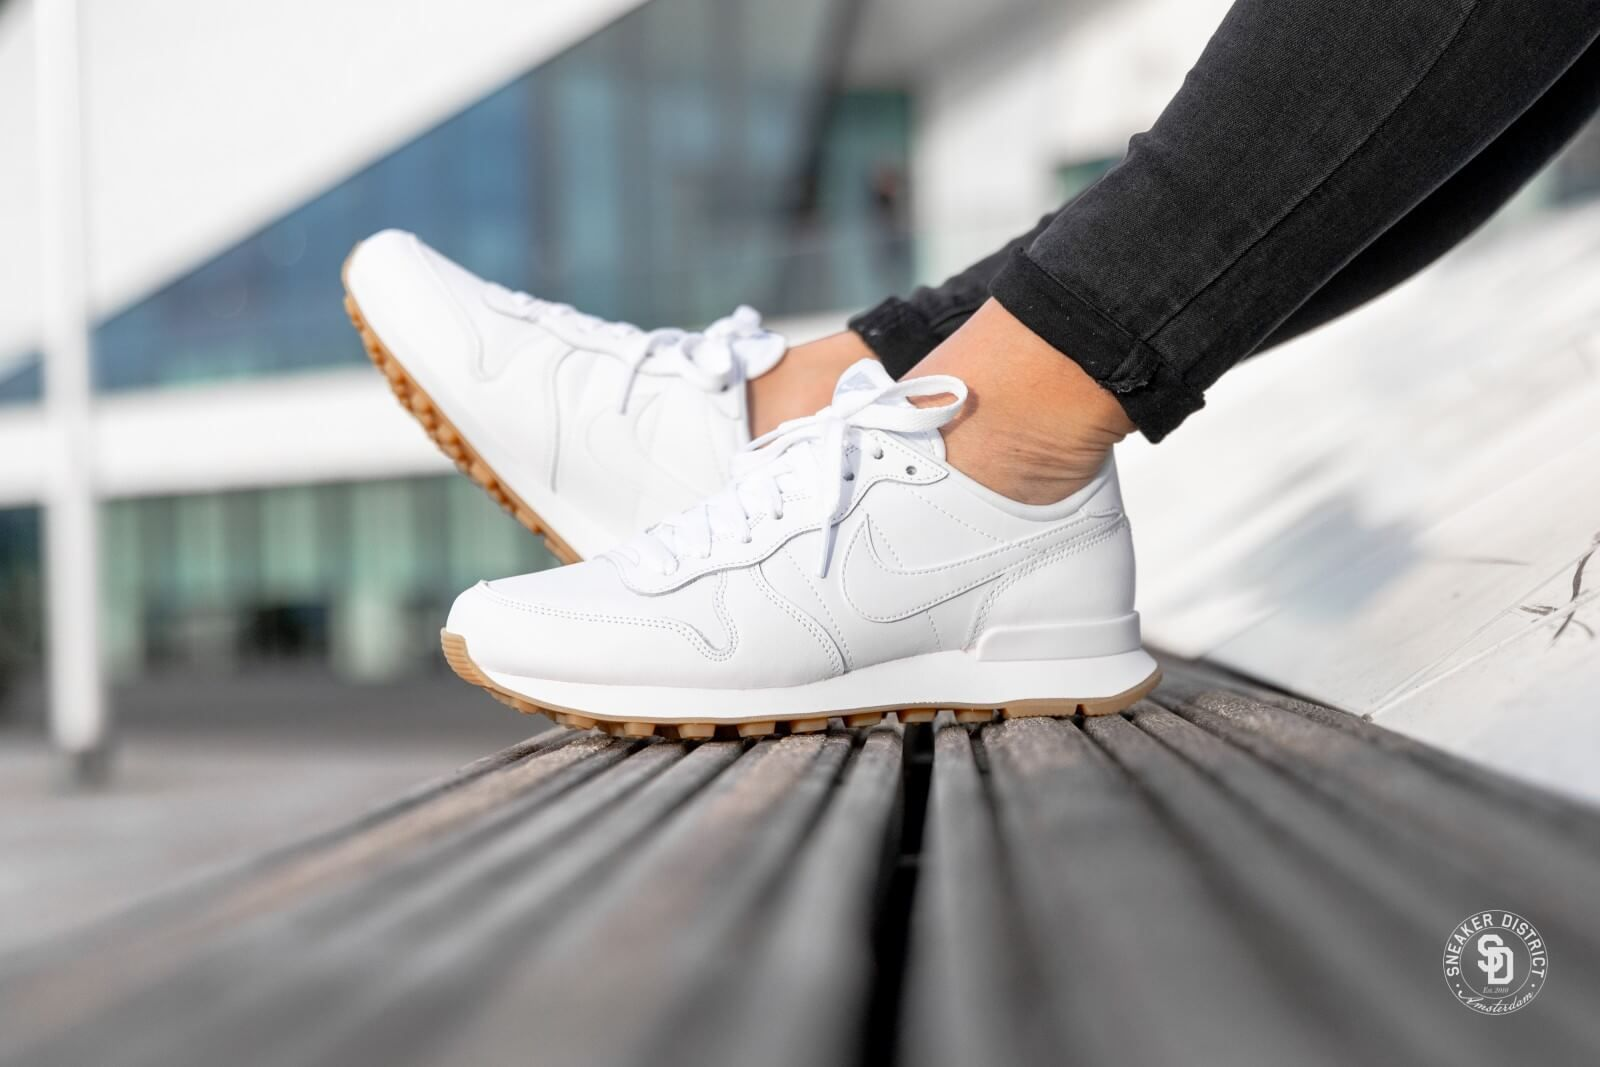 Nike Women's Internationalist WhiteWhite Gum Light Brown